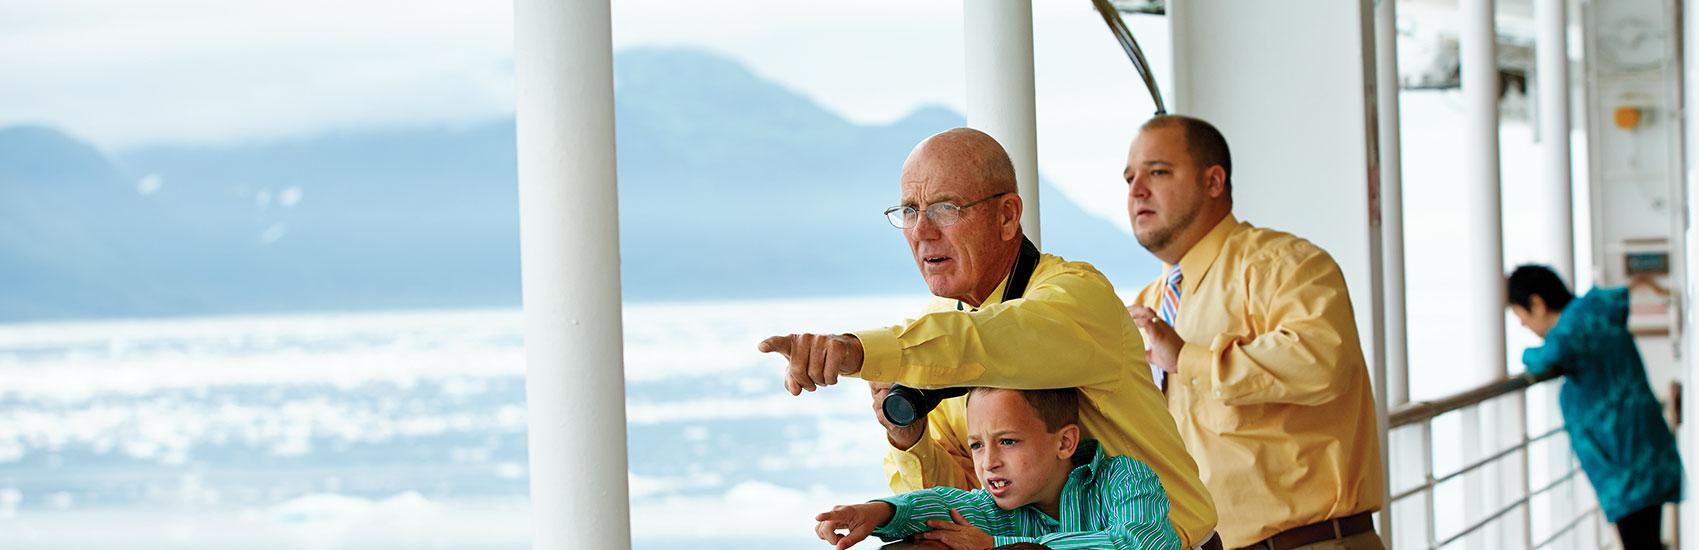 Alaska Cruise Excursions with Princess 4